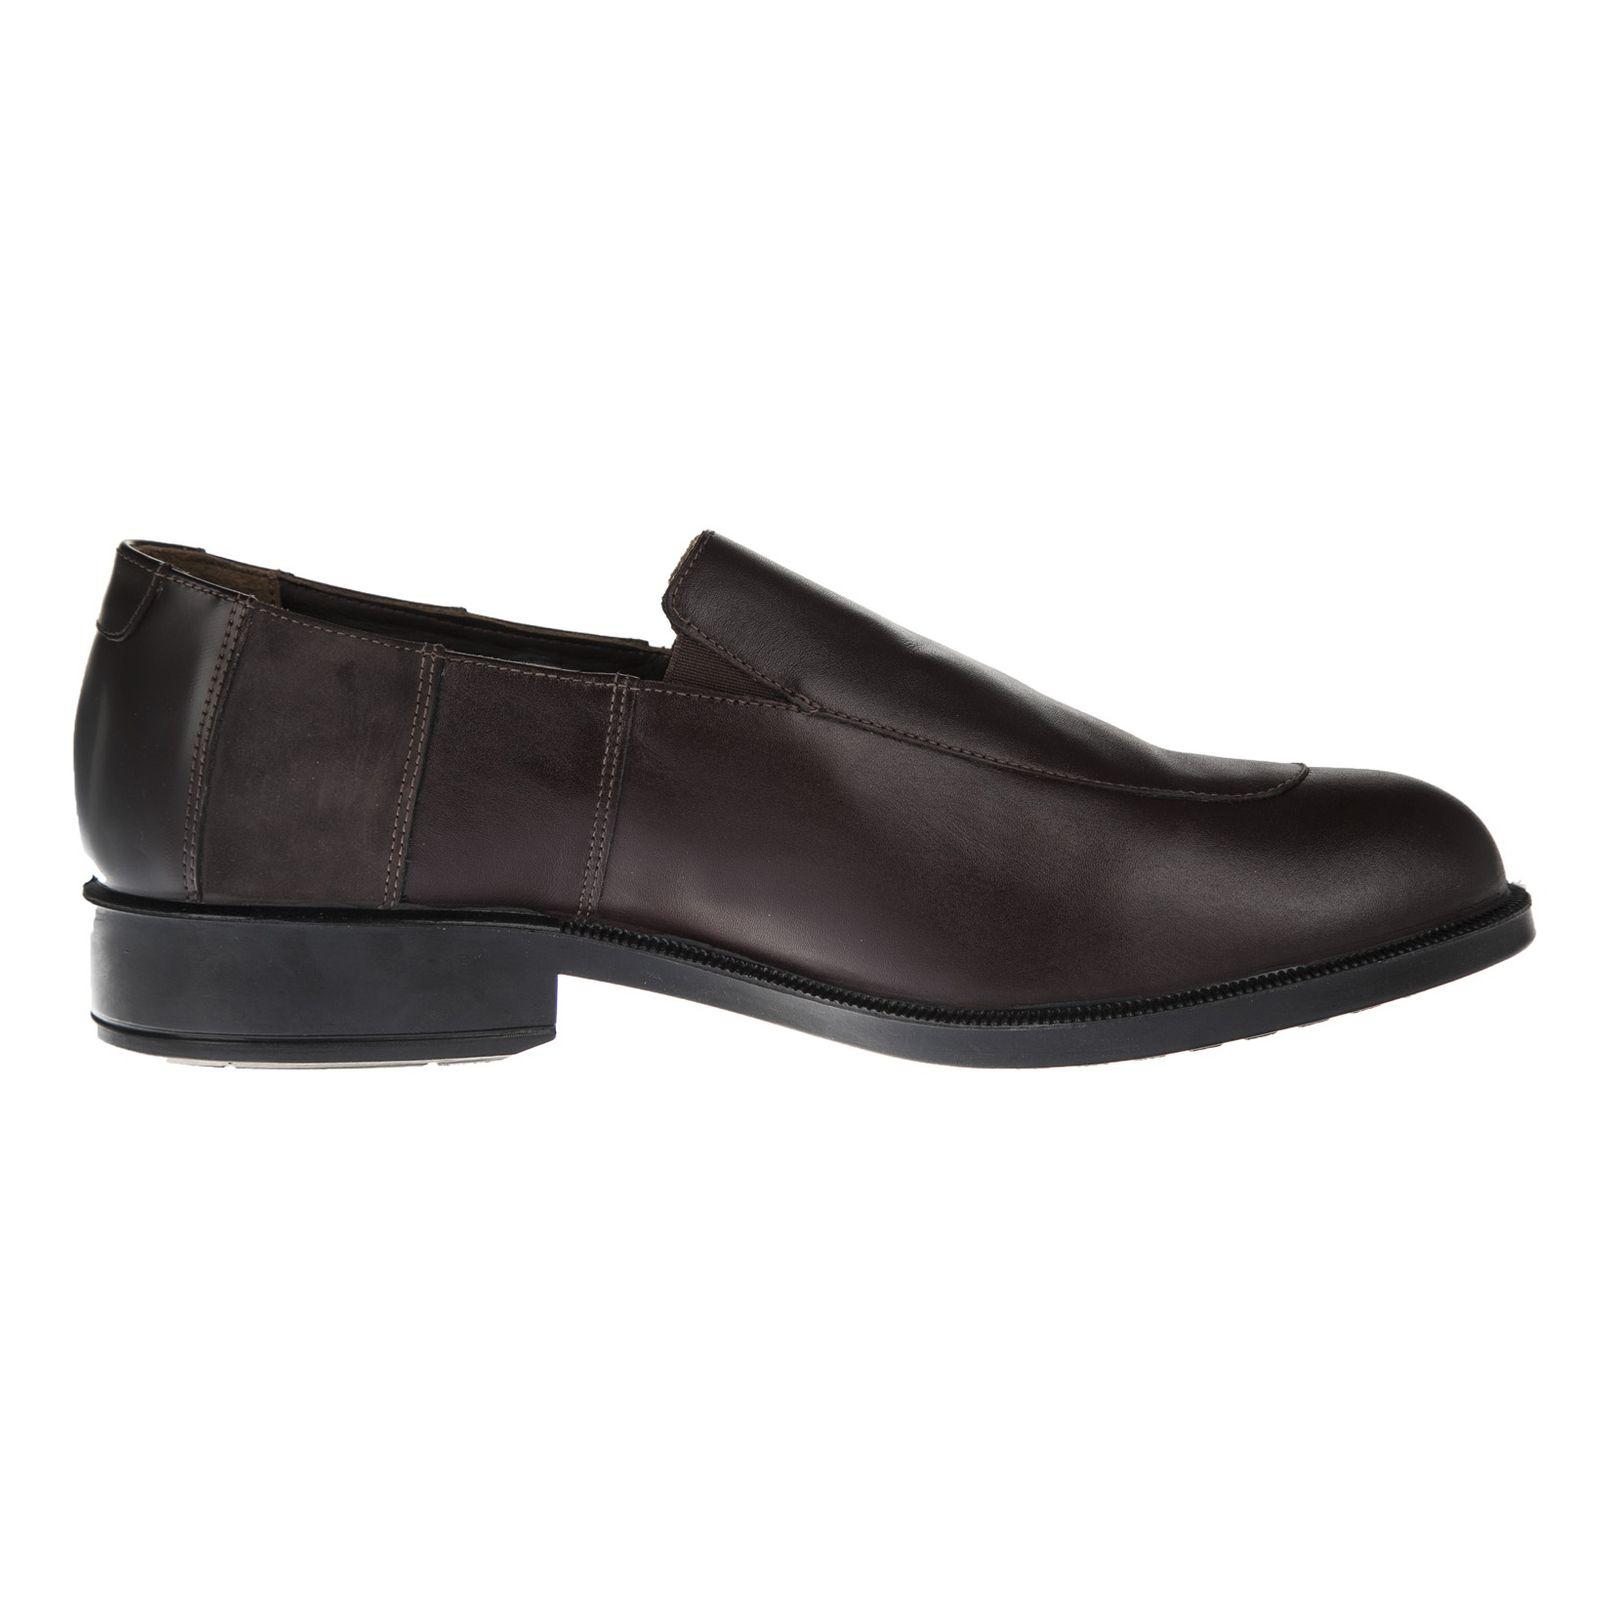 کفش مردانه دنیلی مدل 209110136019 -  - 4